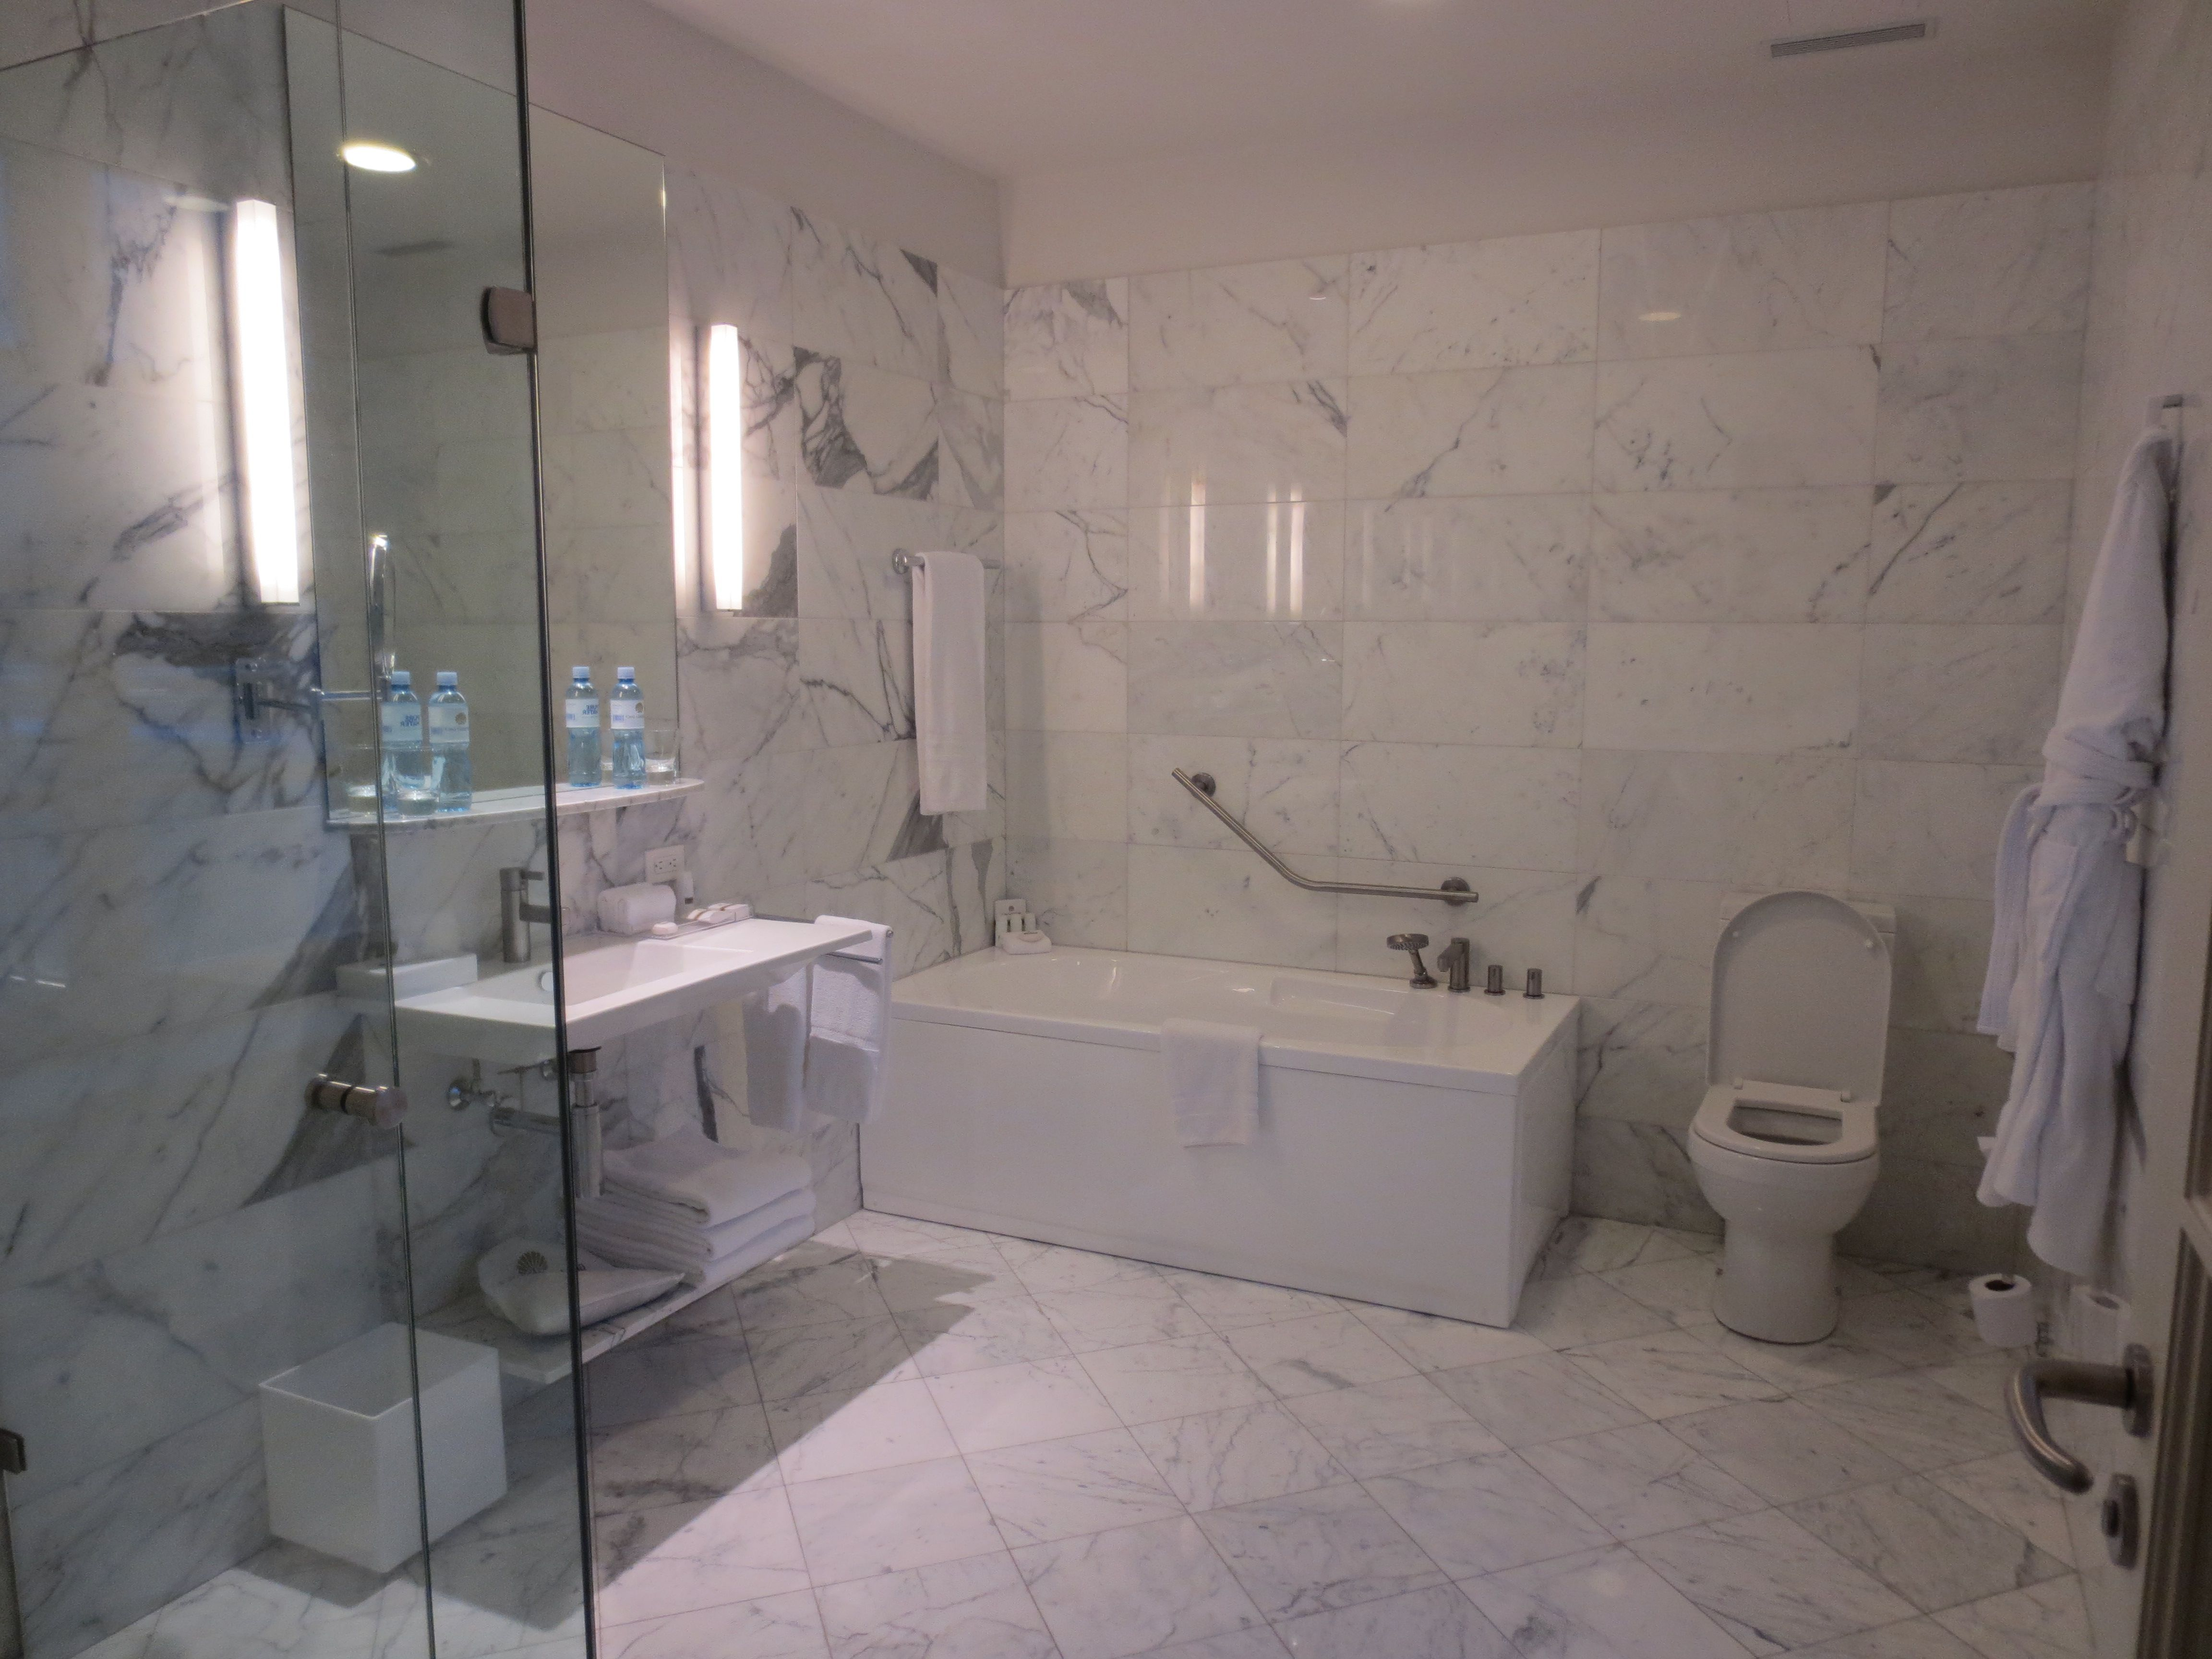 A washroom fit for a king Ecuador VM. A washroom fit for a king Ecuador VM   Trufflepig